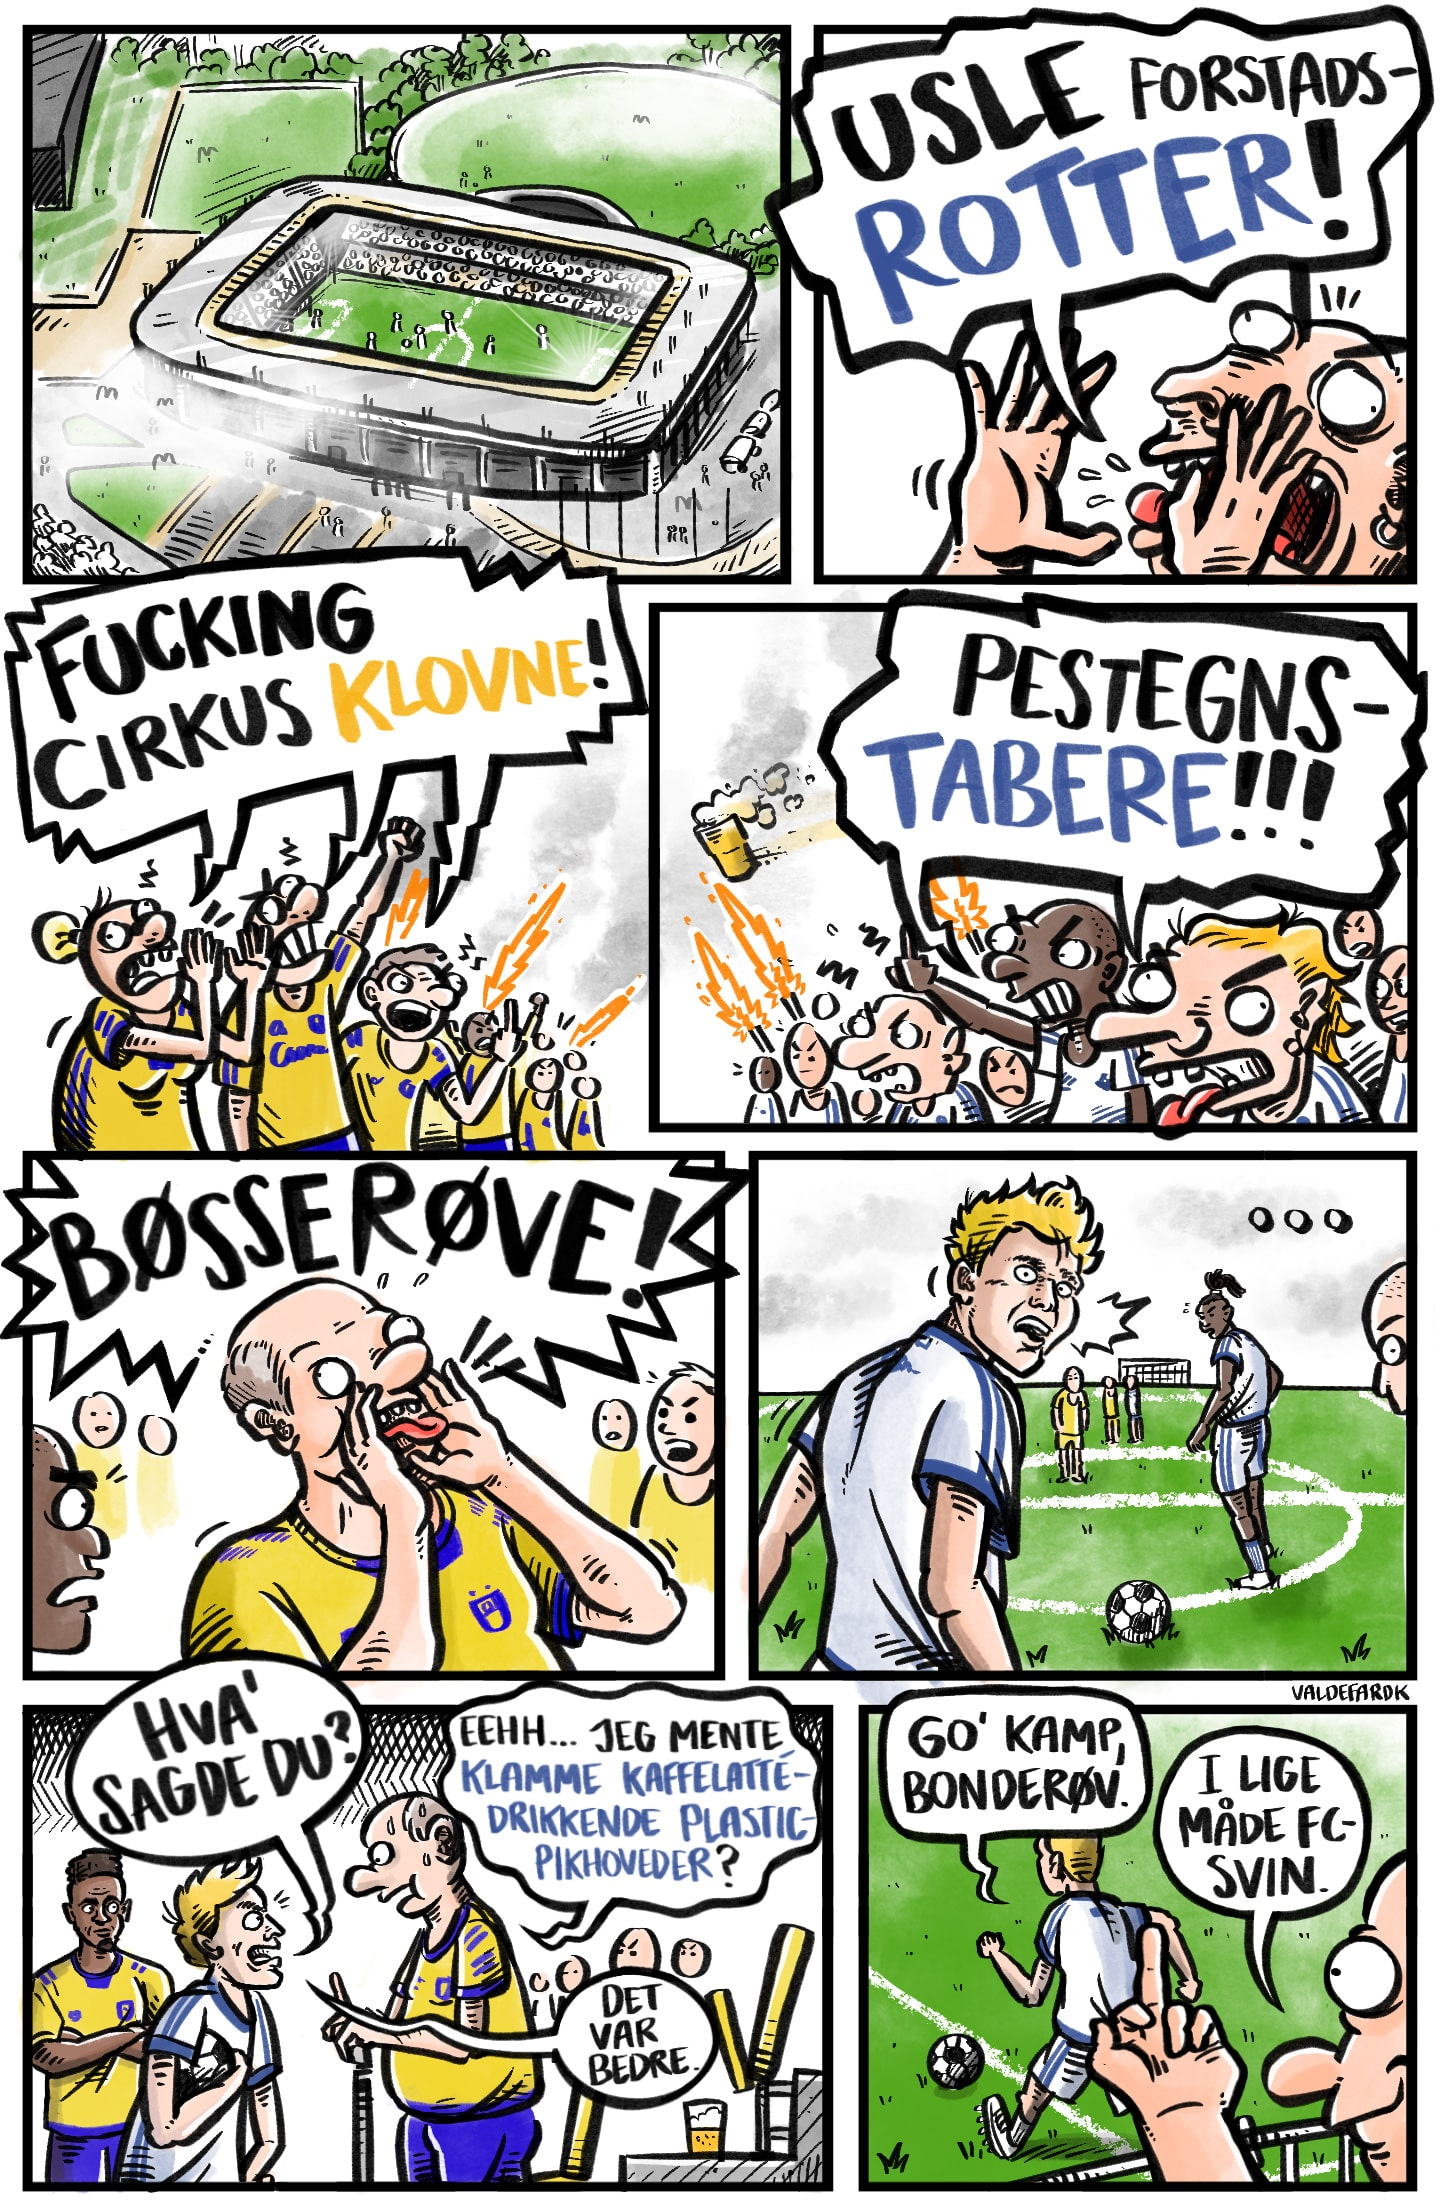 Må man råbe 'bøsse' til en fodboldkamp?